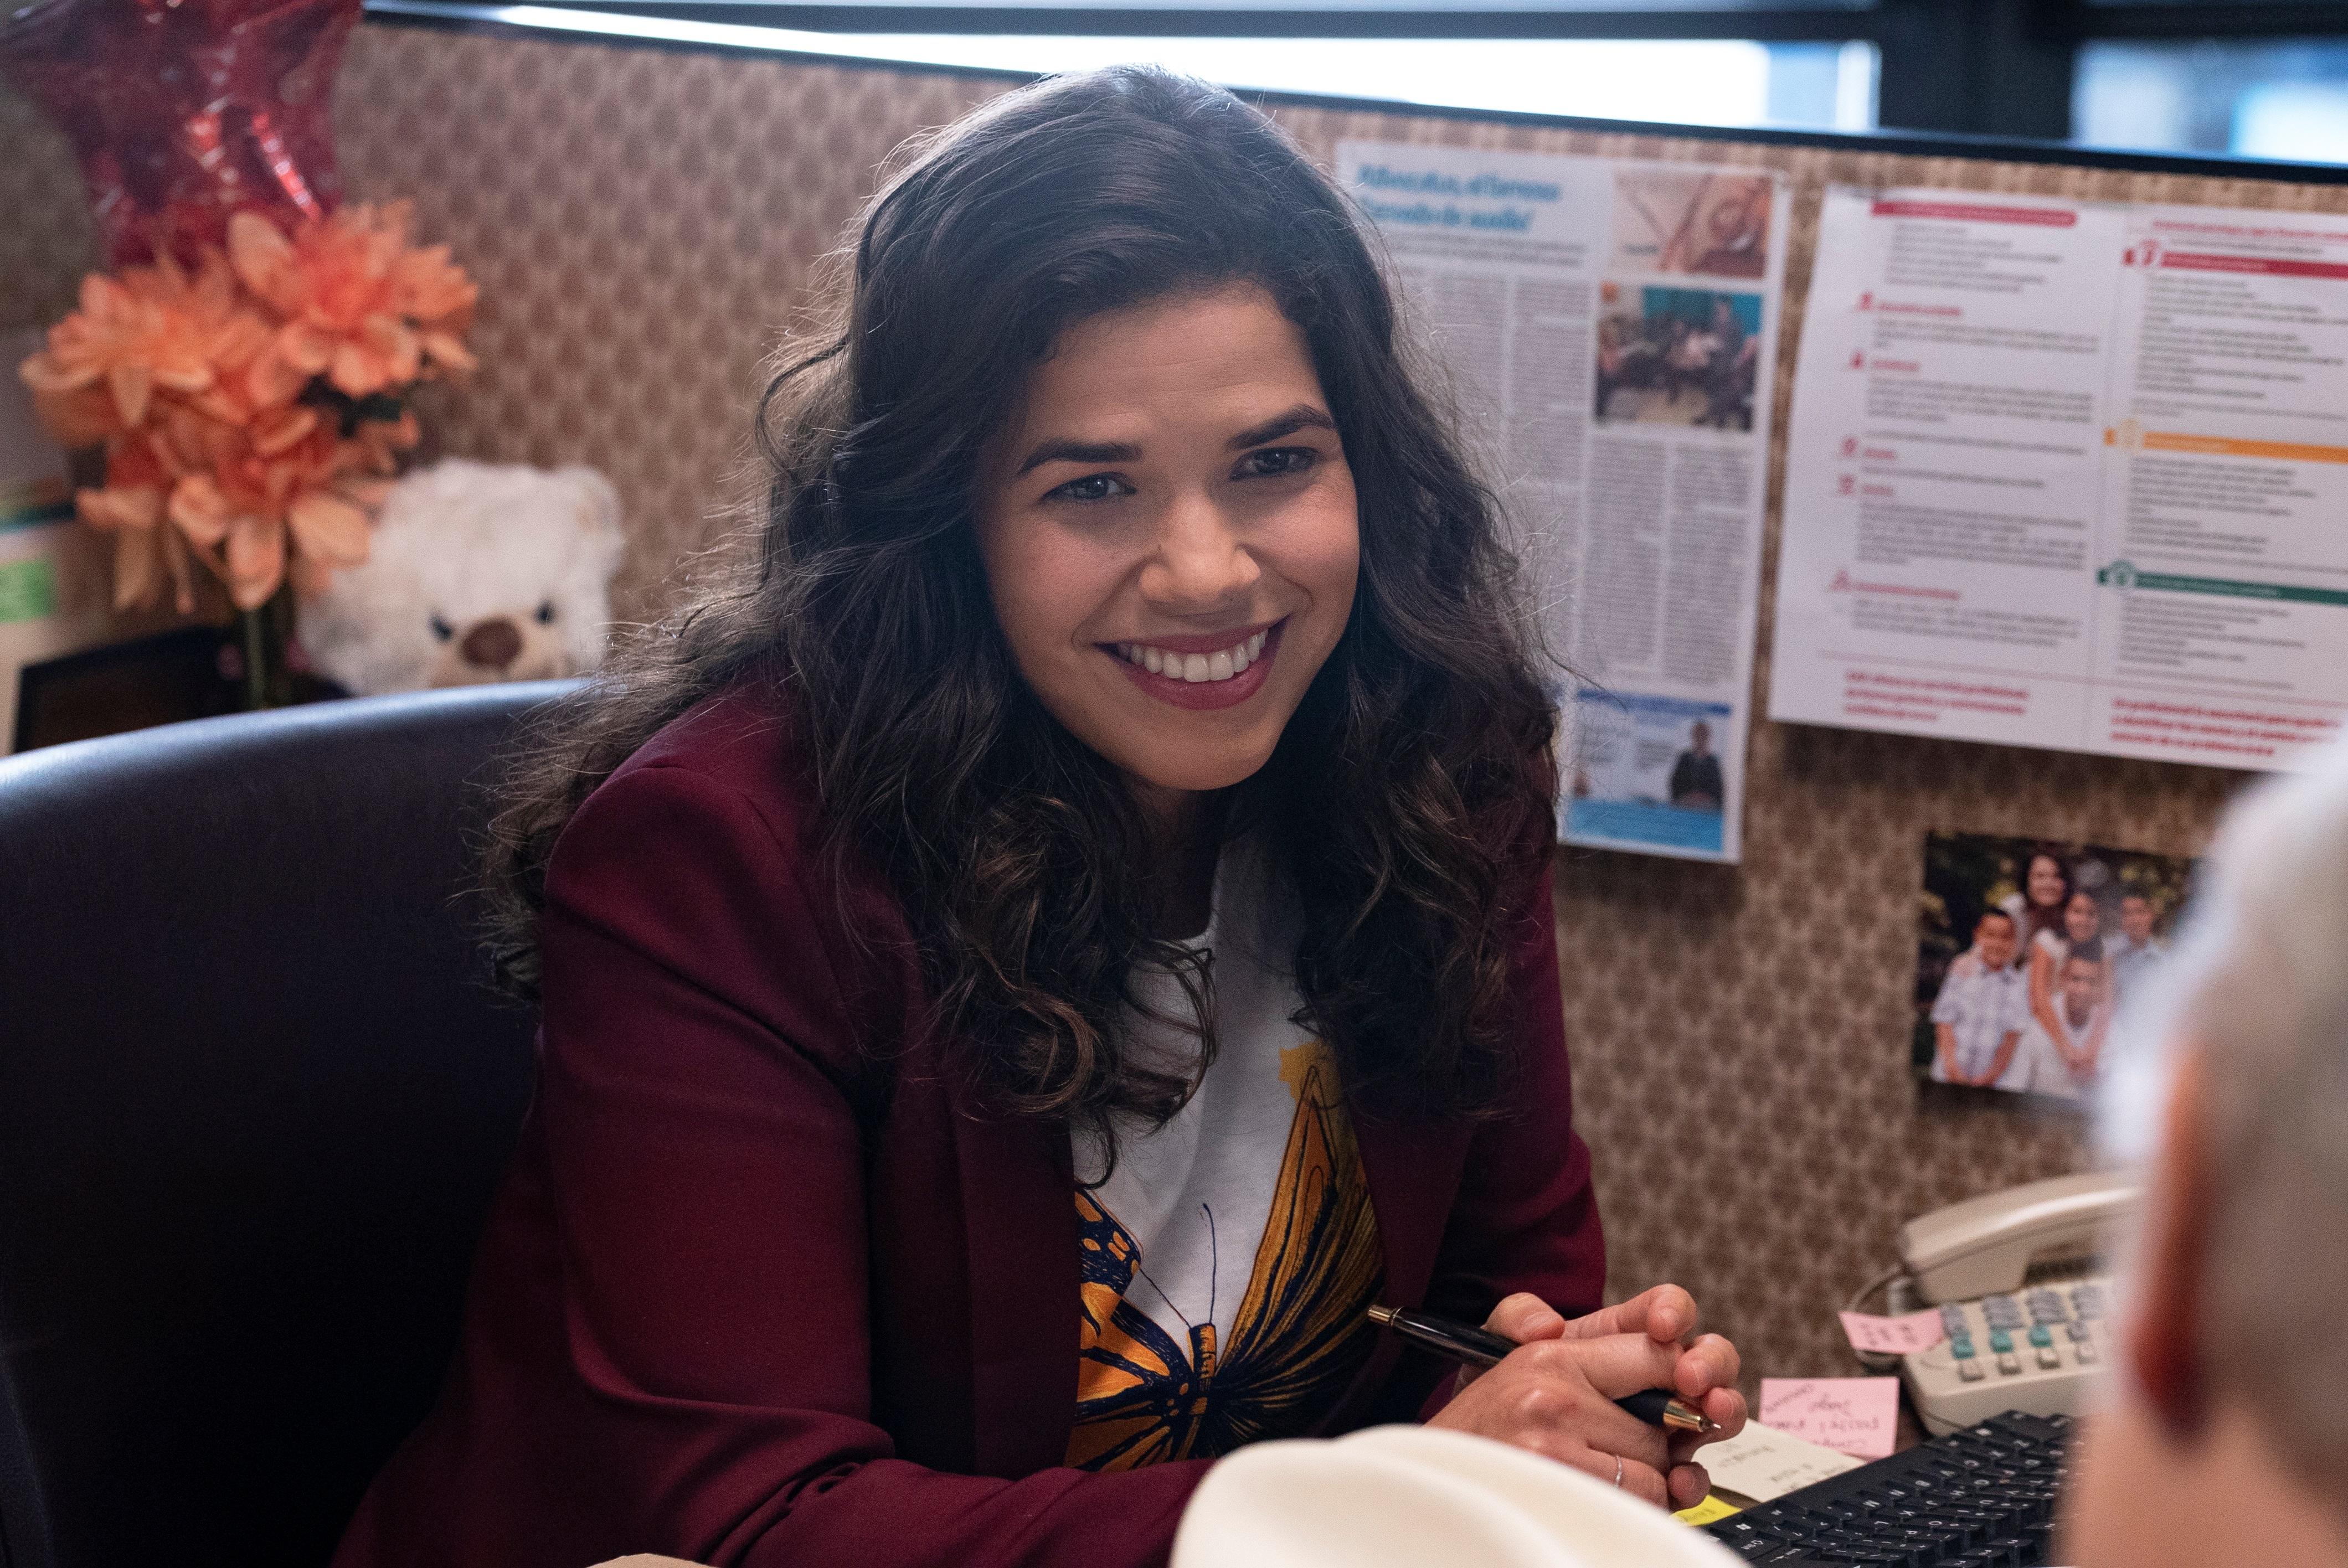 America Ferrera debuta en Netflix en febrero con la serie latina